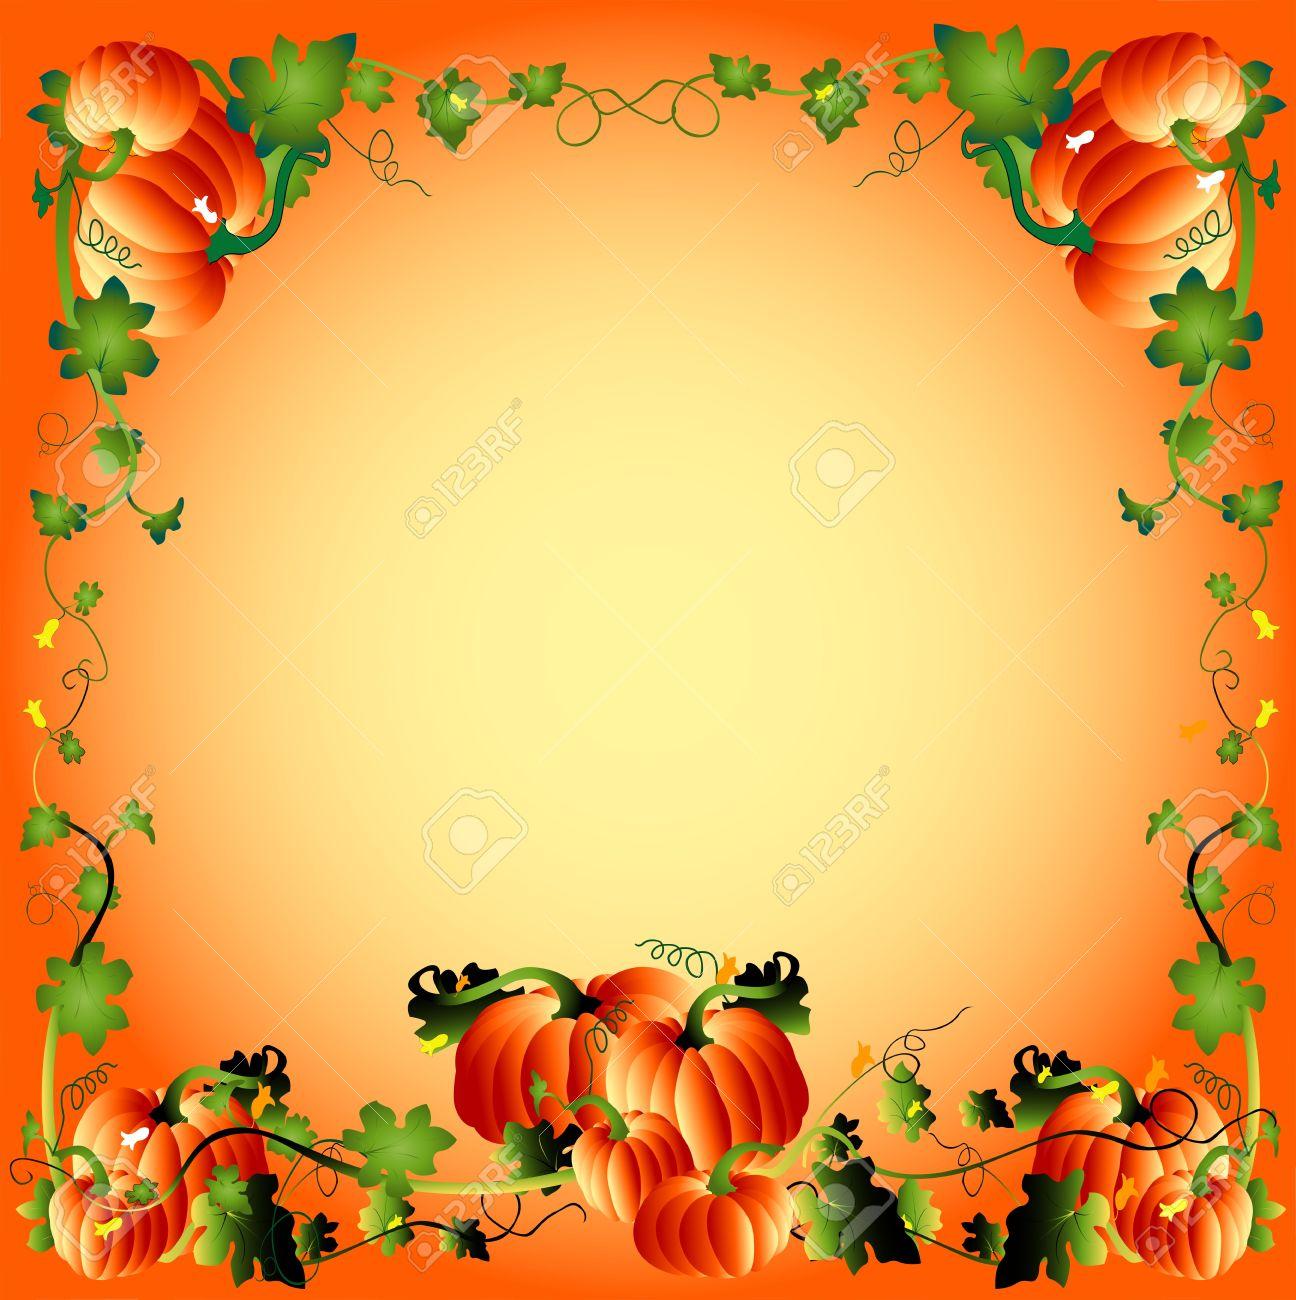 Pumpikin Frame, Autumn Athmosphere Illustration Stock Photo, Picture ...